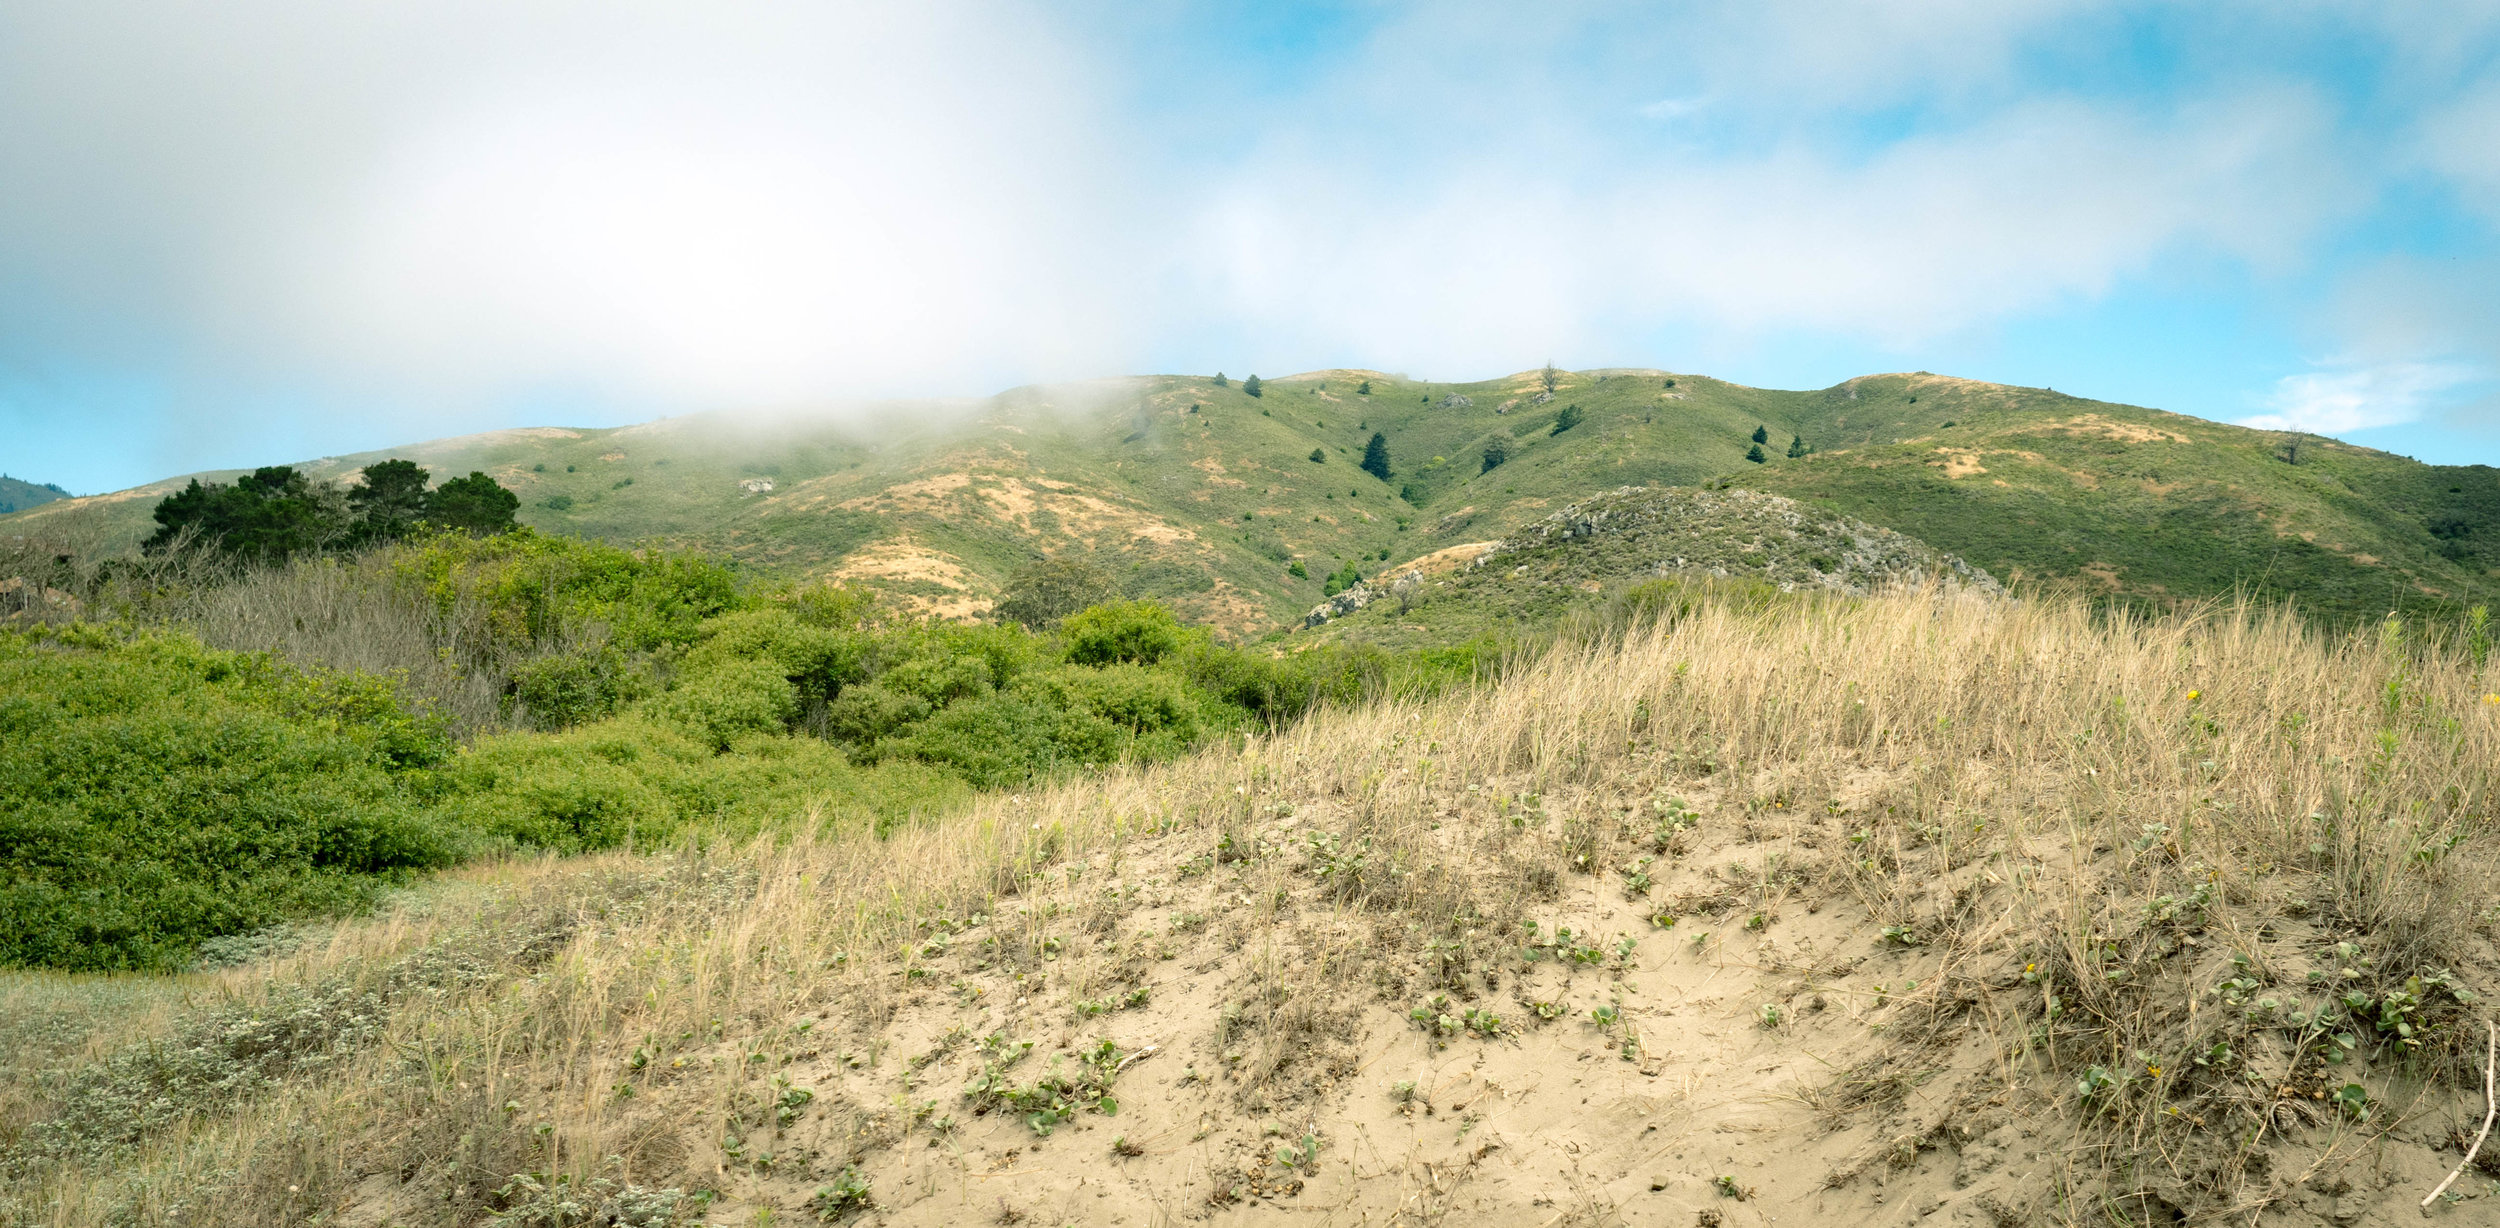 The hills above Muir Beach.